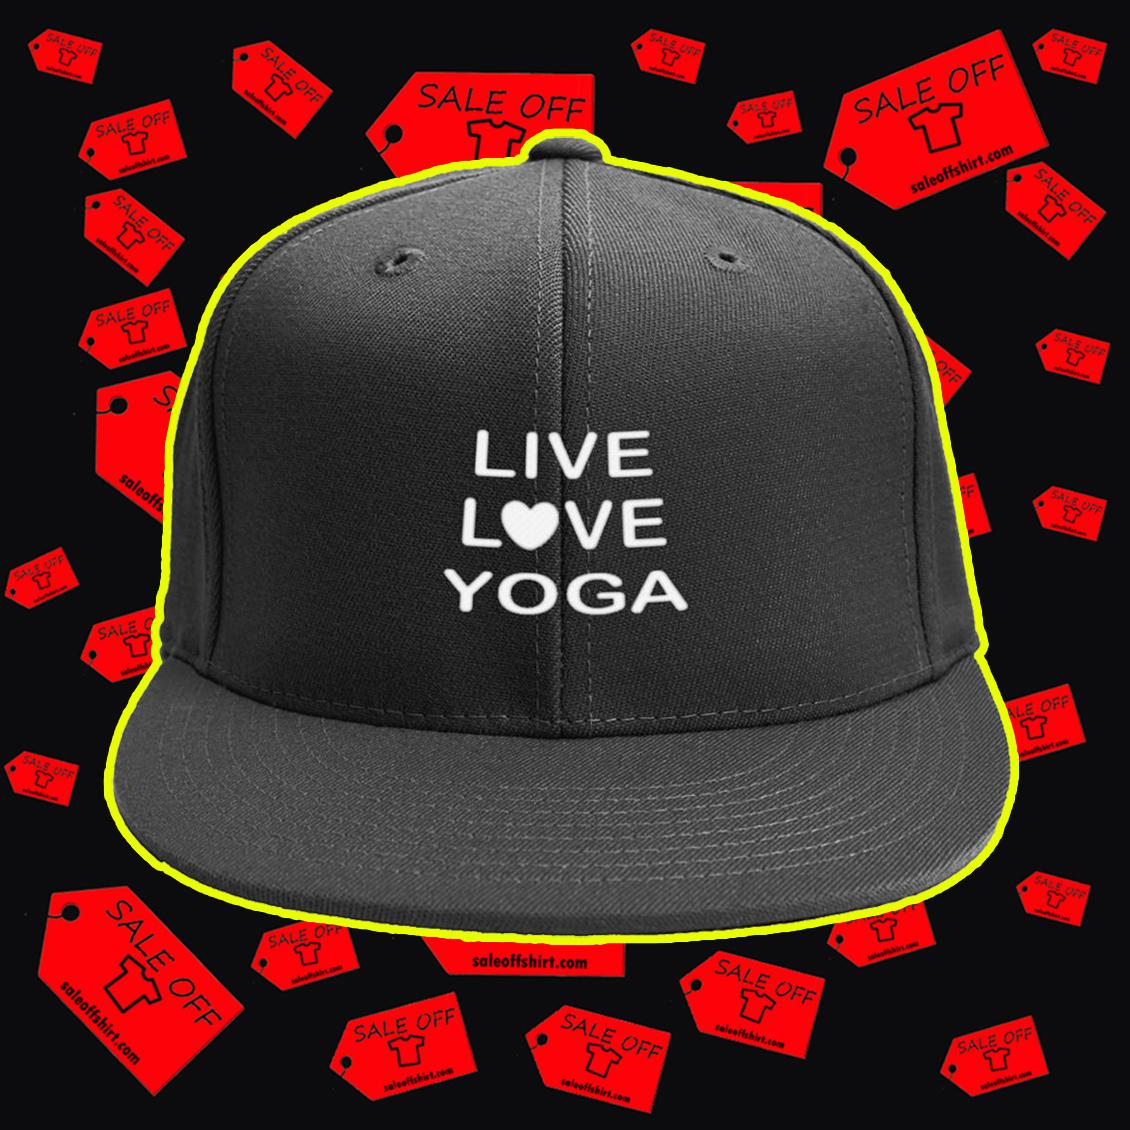 Live love yoga snapback